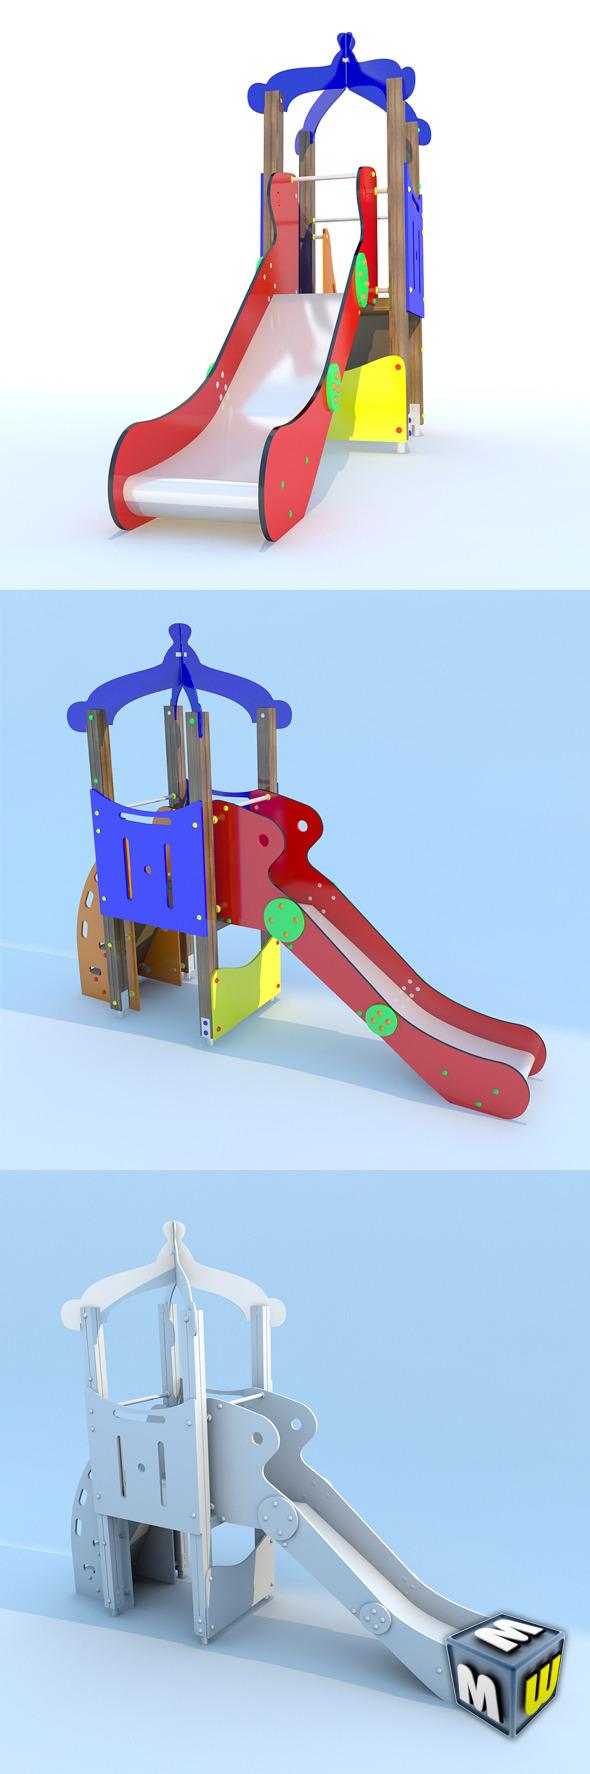 3DOcean Playground FunTower Baby 1 5111178